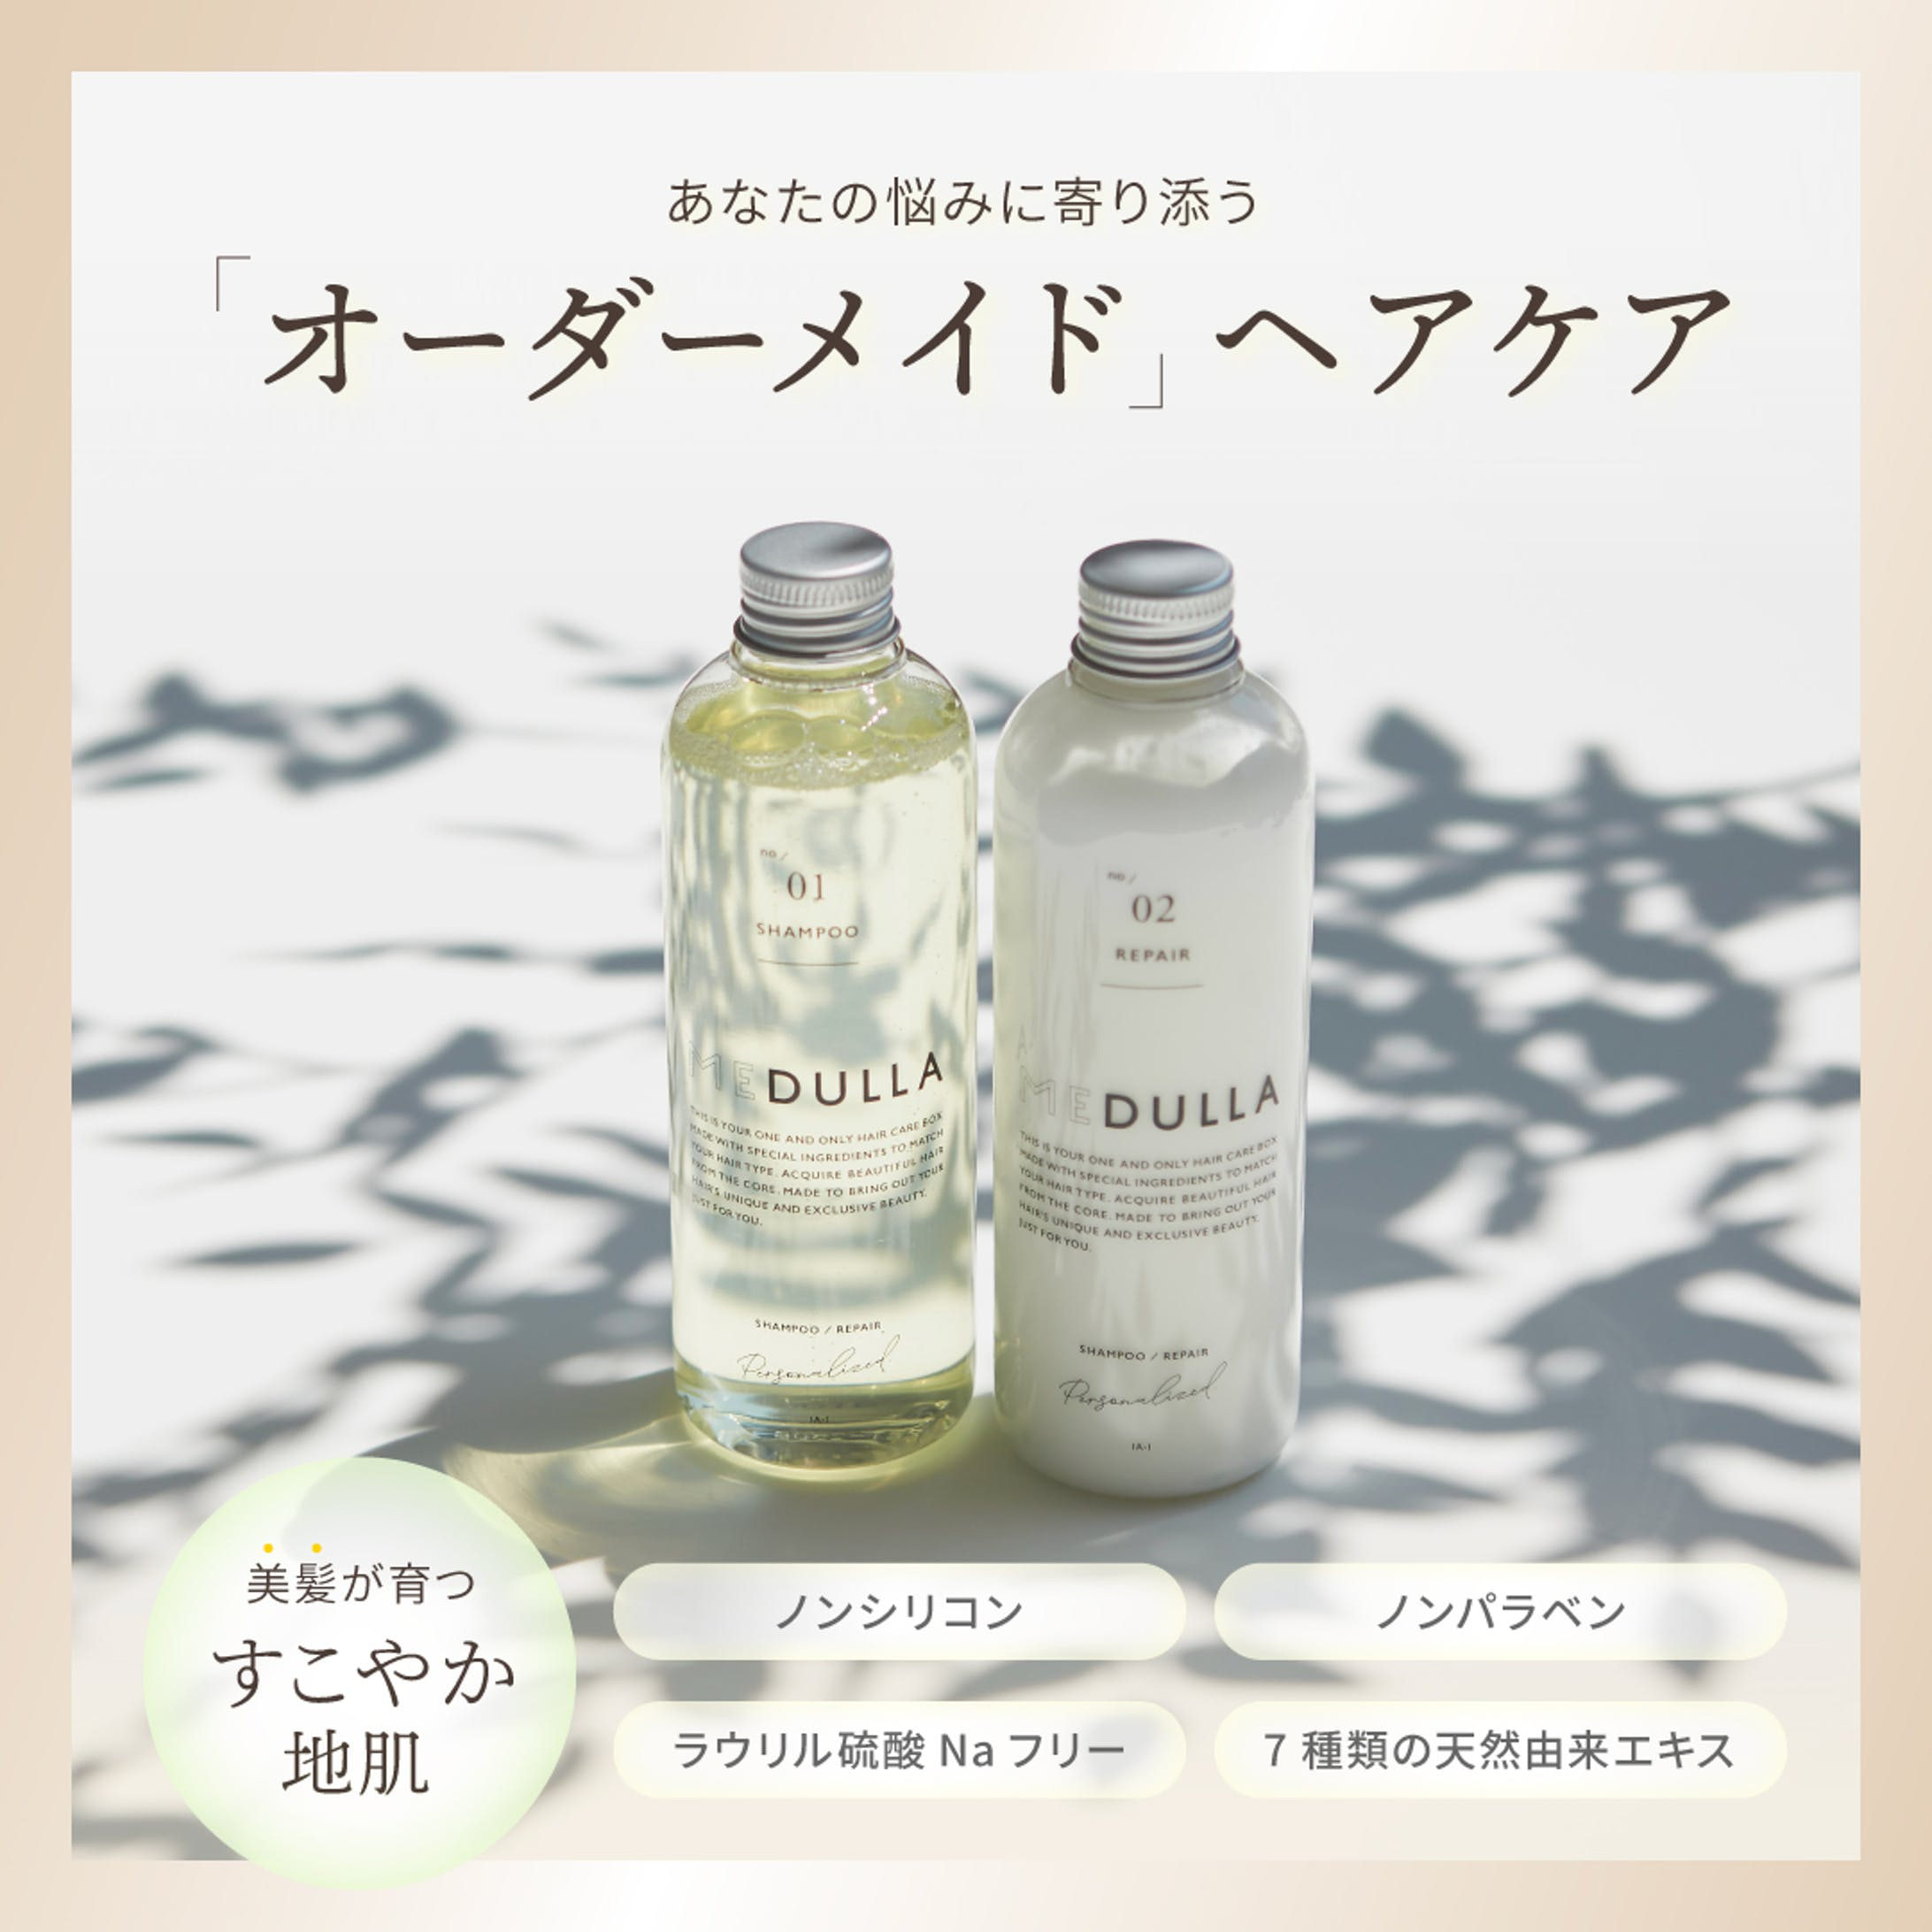 【SNS用バナー】(株)Sparty様 Medulla-1